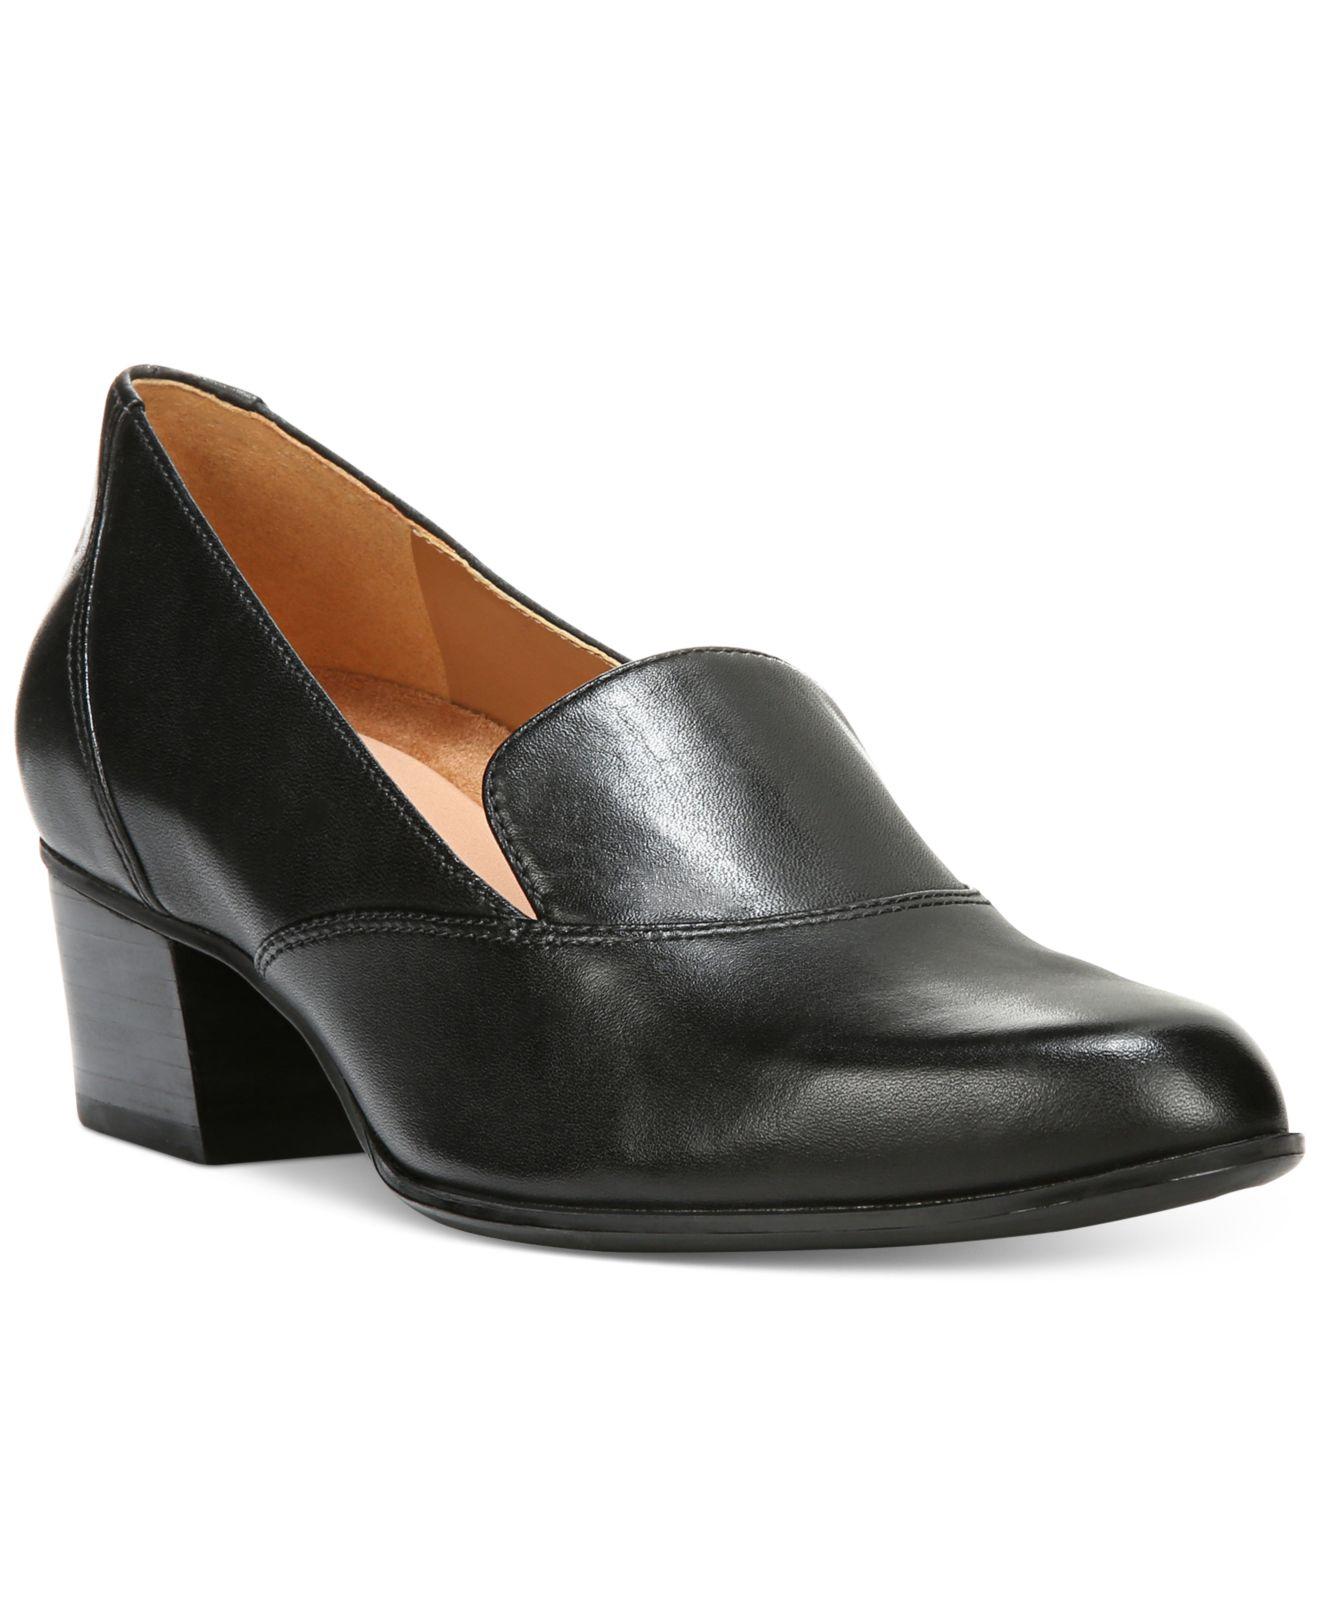 Womens Shoes Naturalizer Taylor Black